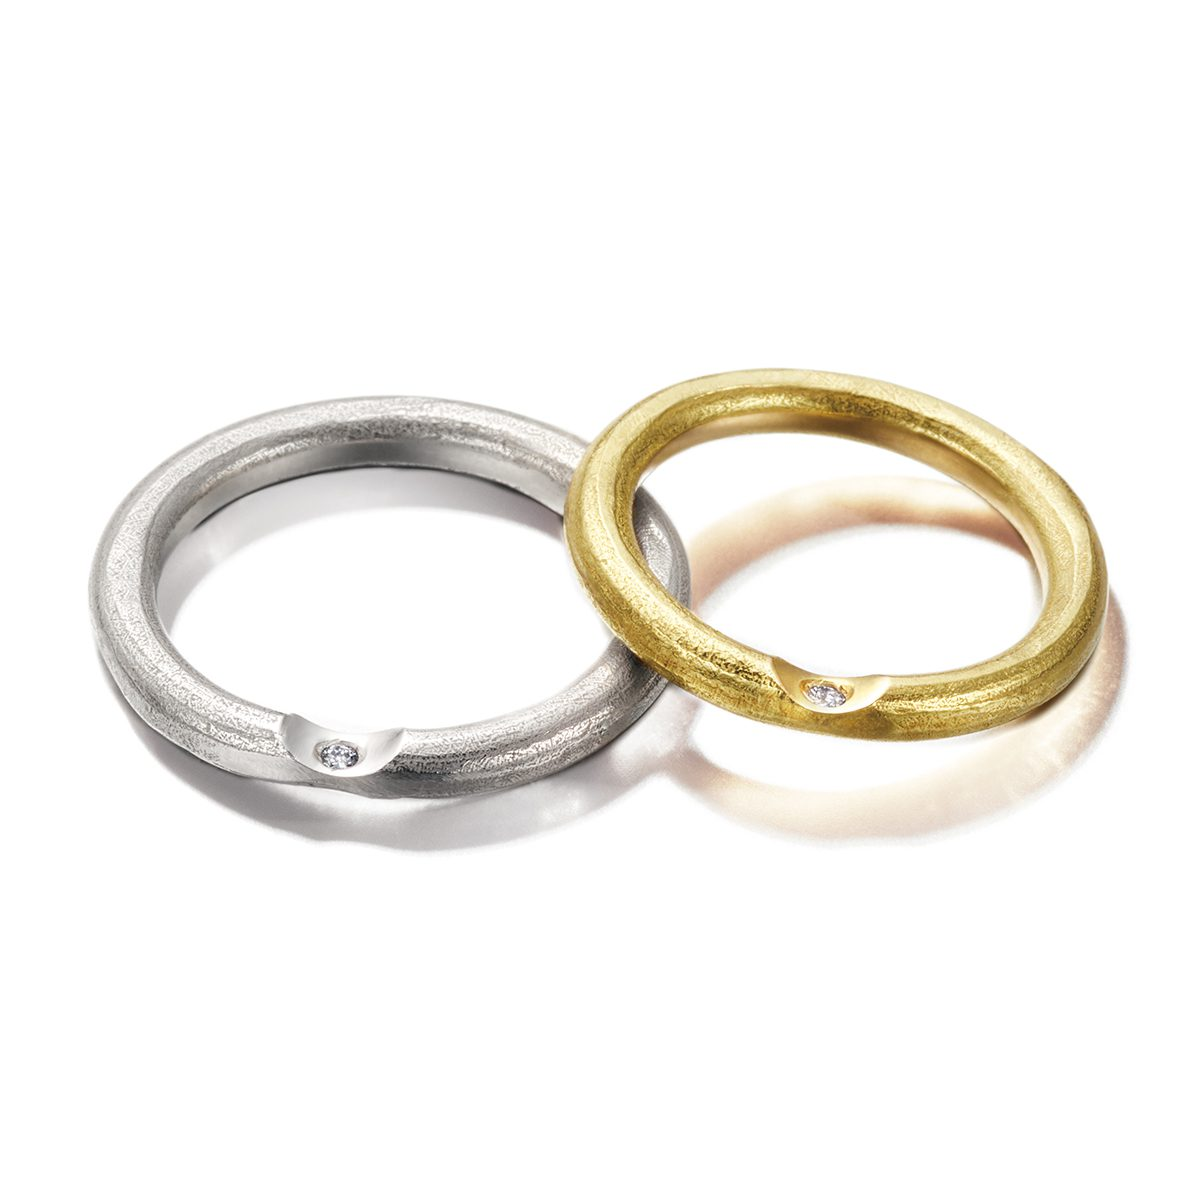 IOSSELLIANI - Abbraccio Marriage Rings